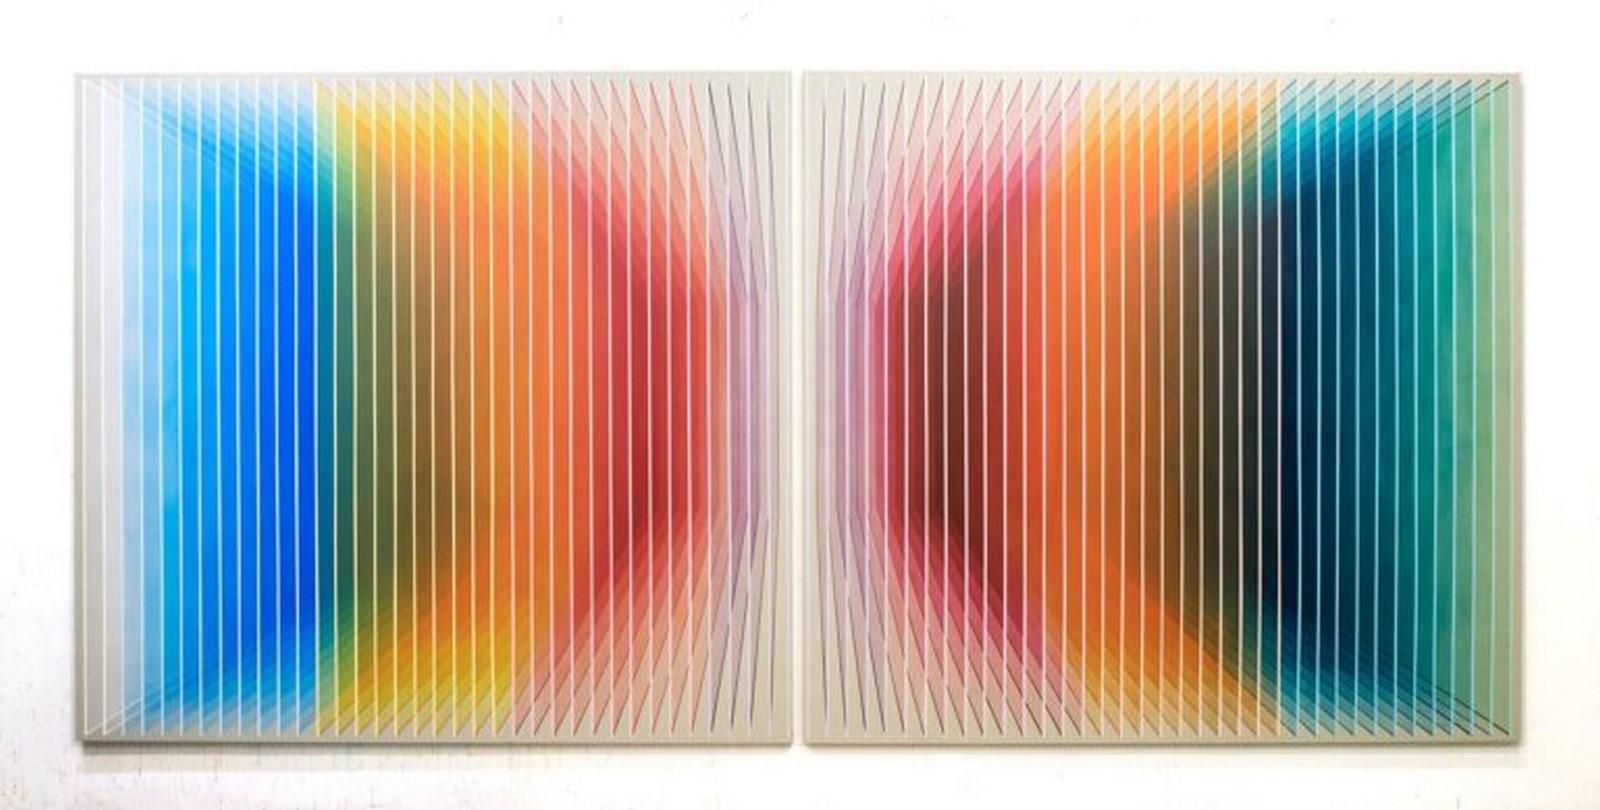 Daniel Mullen: Merging Art and Architecture through painting - Sheet12